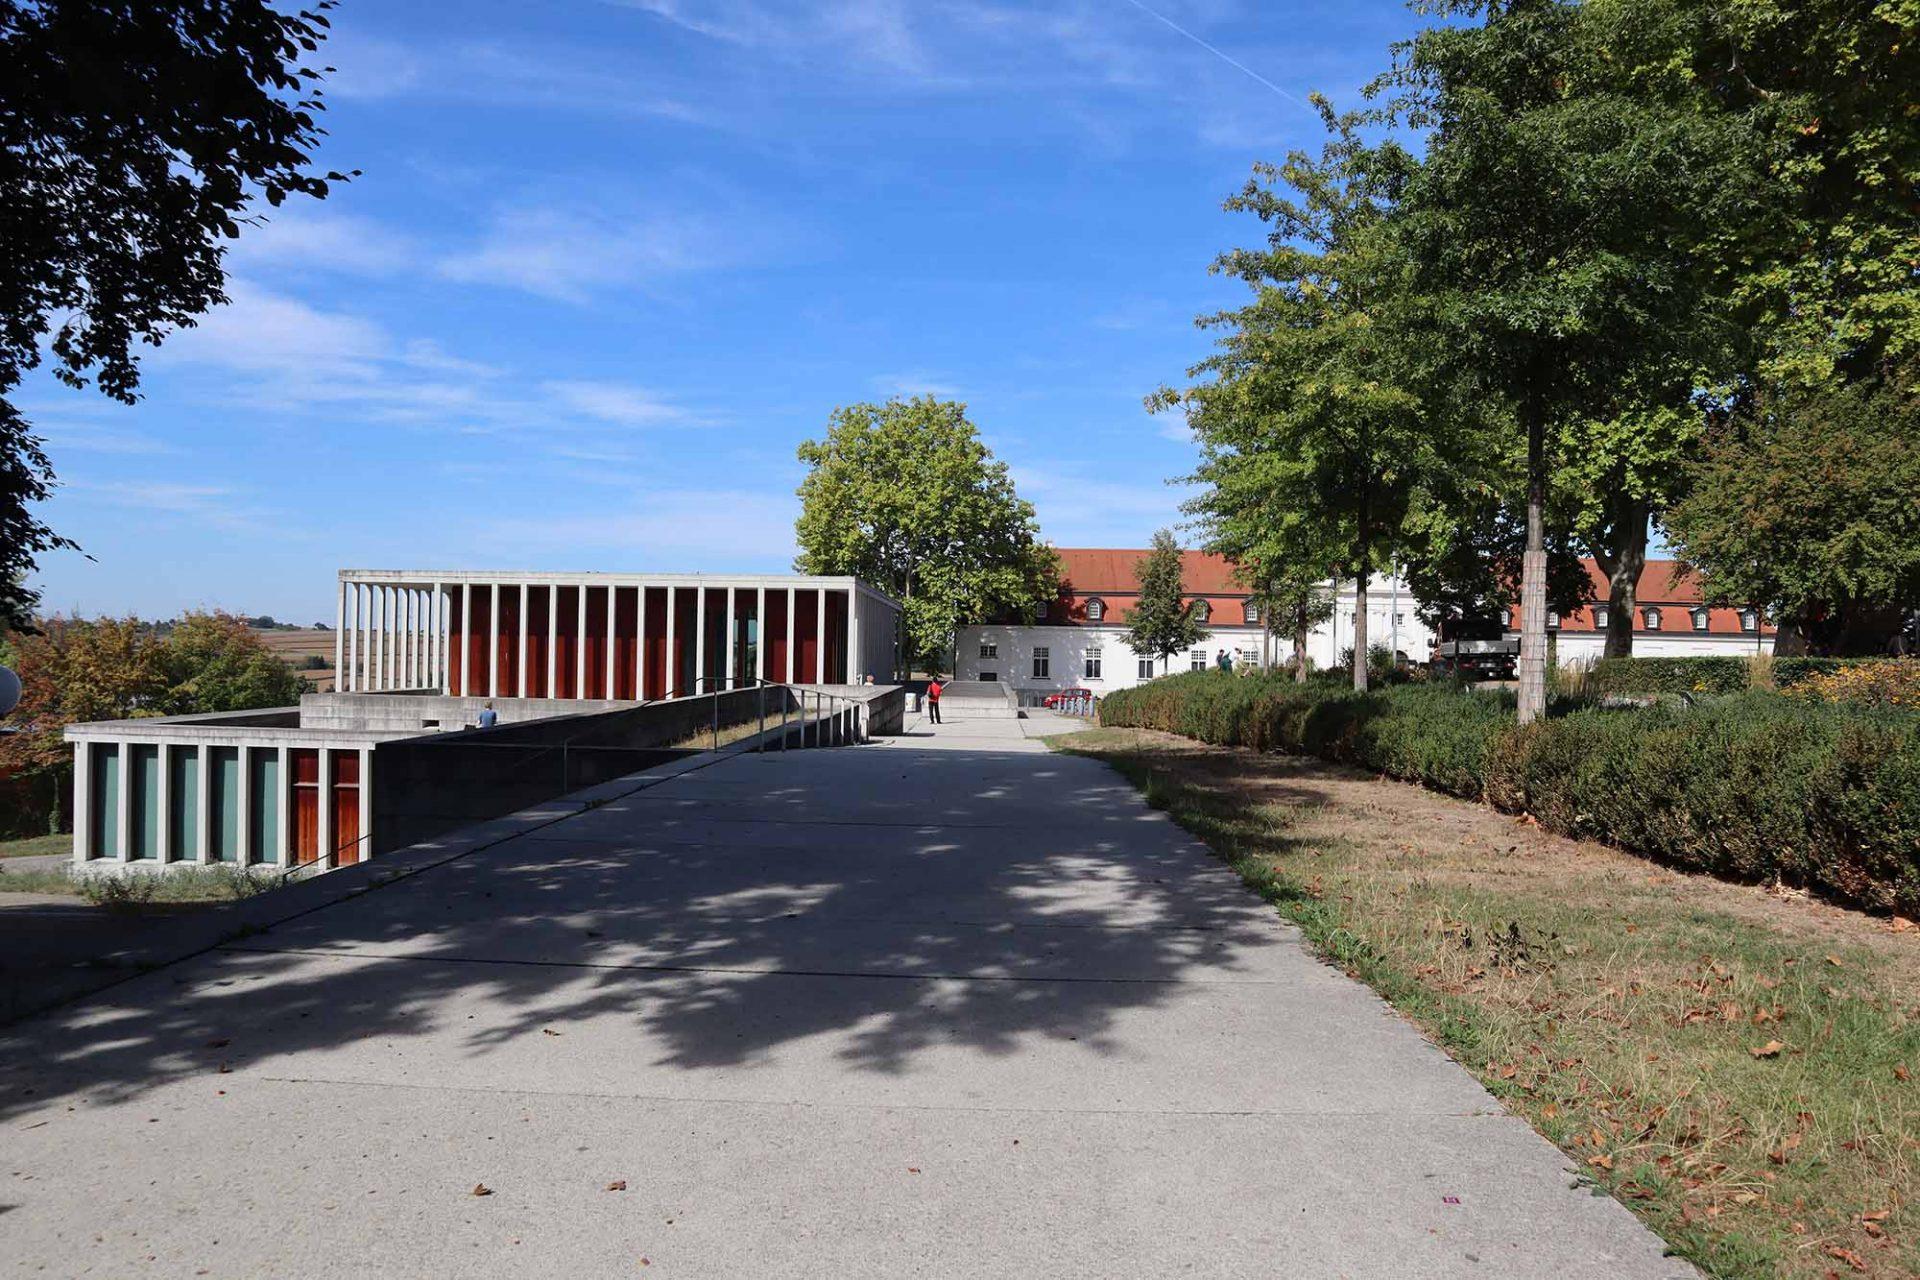 Literaturmuseum der Moderne. Pavillonartiger Kubus